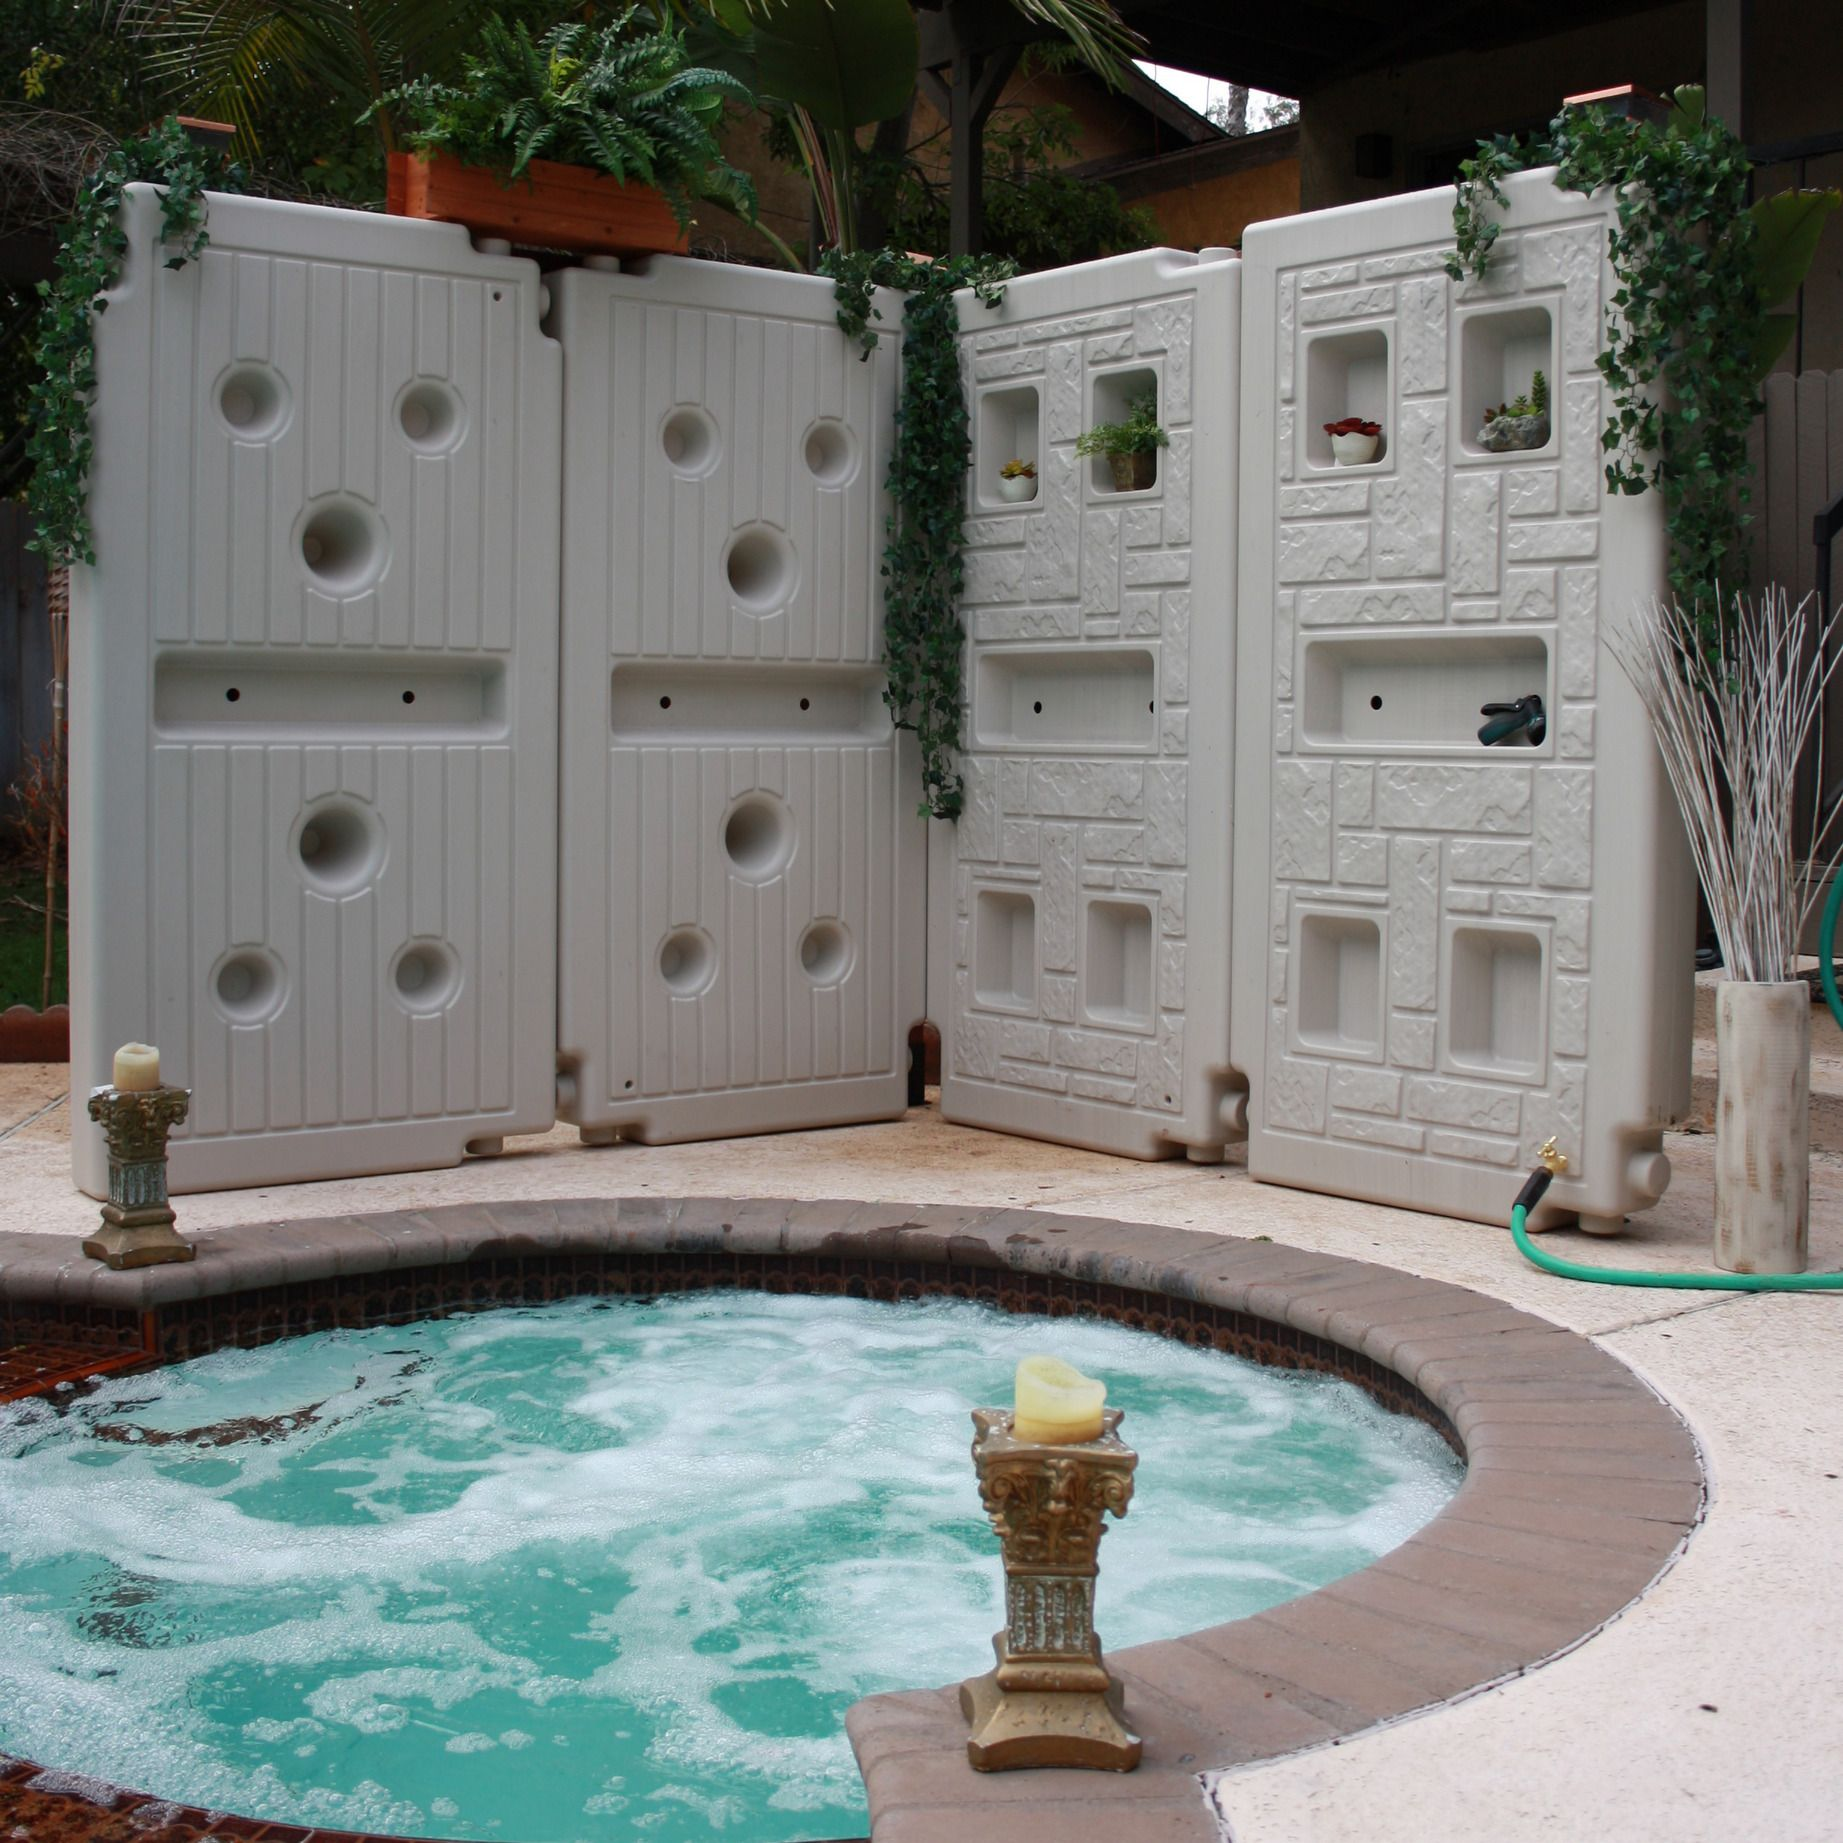 rain harvesting system plus solar pool heater sweet cool idea